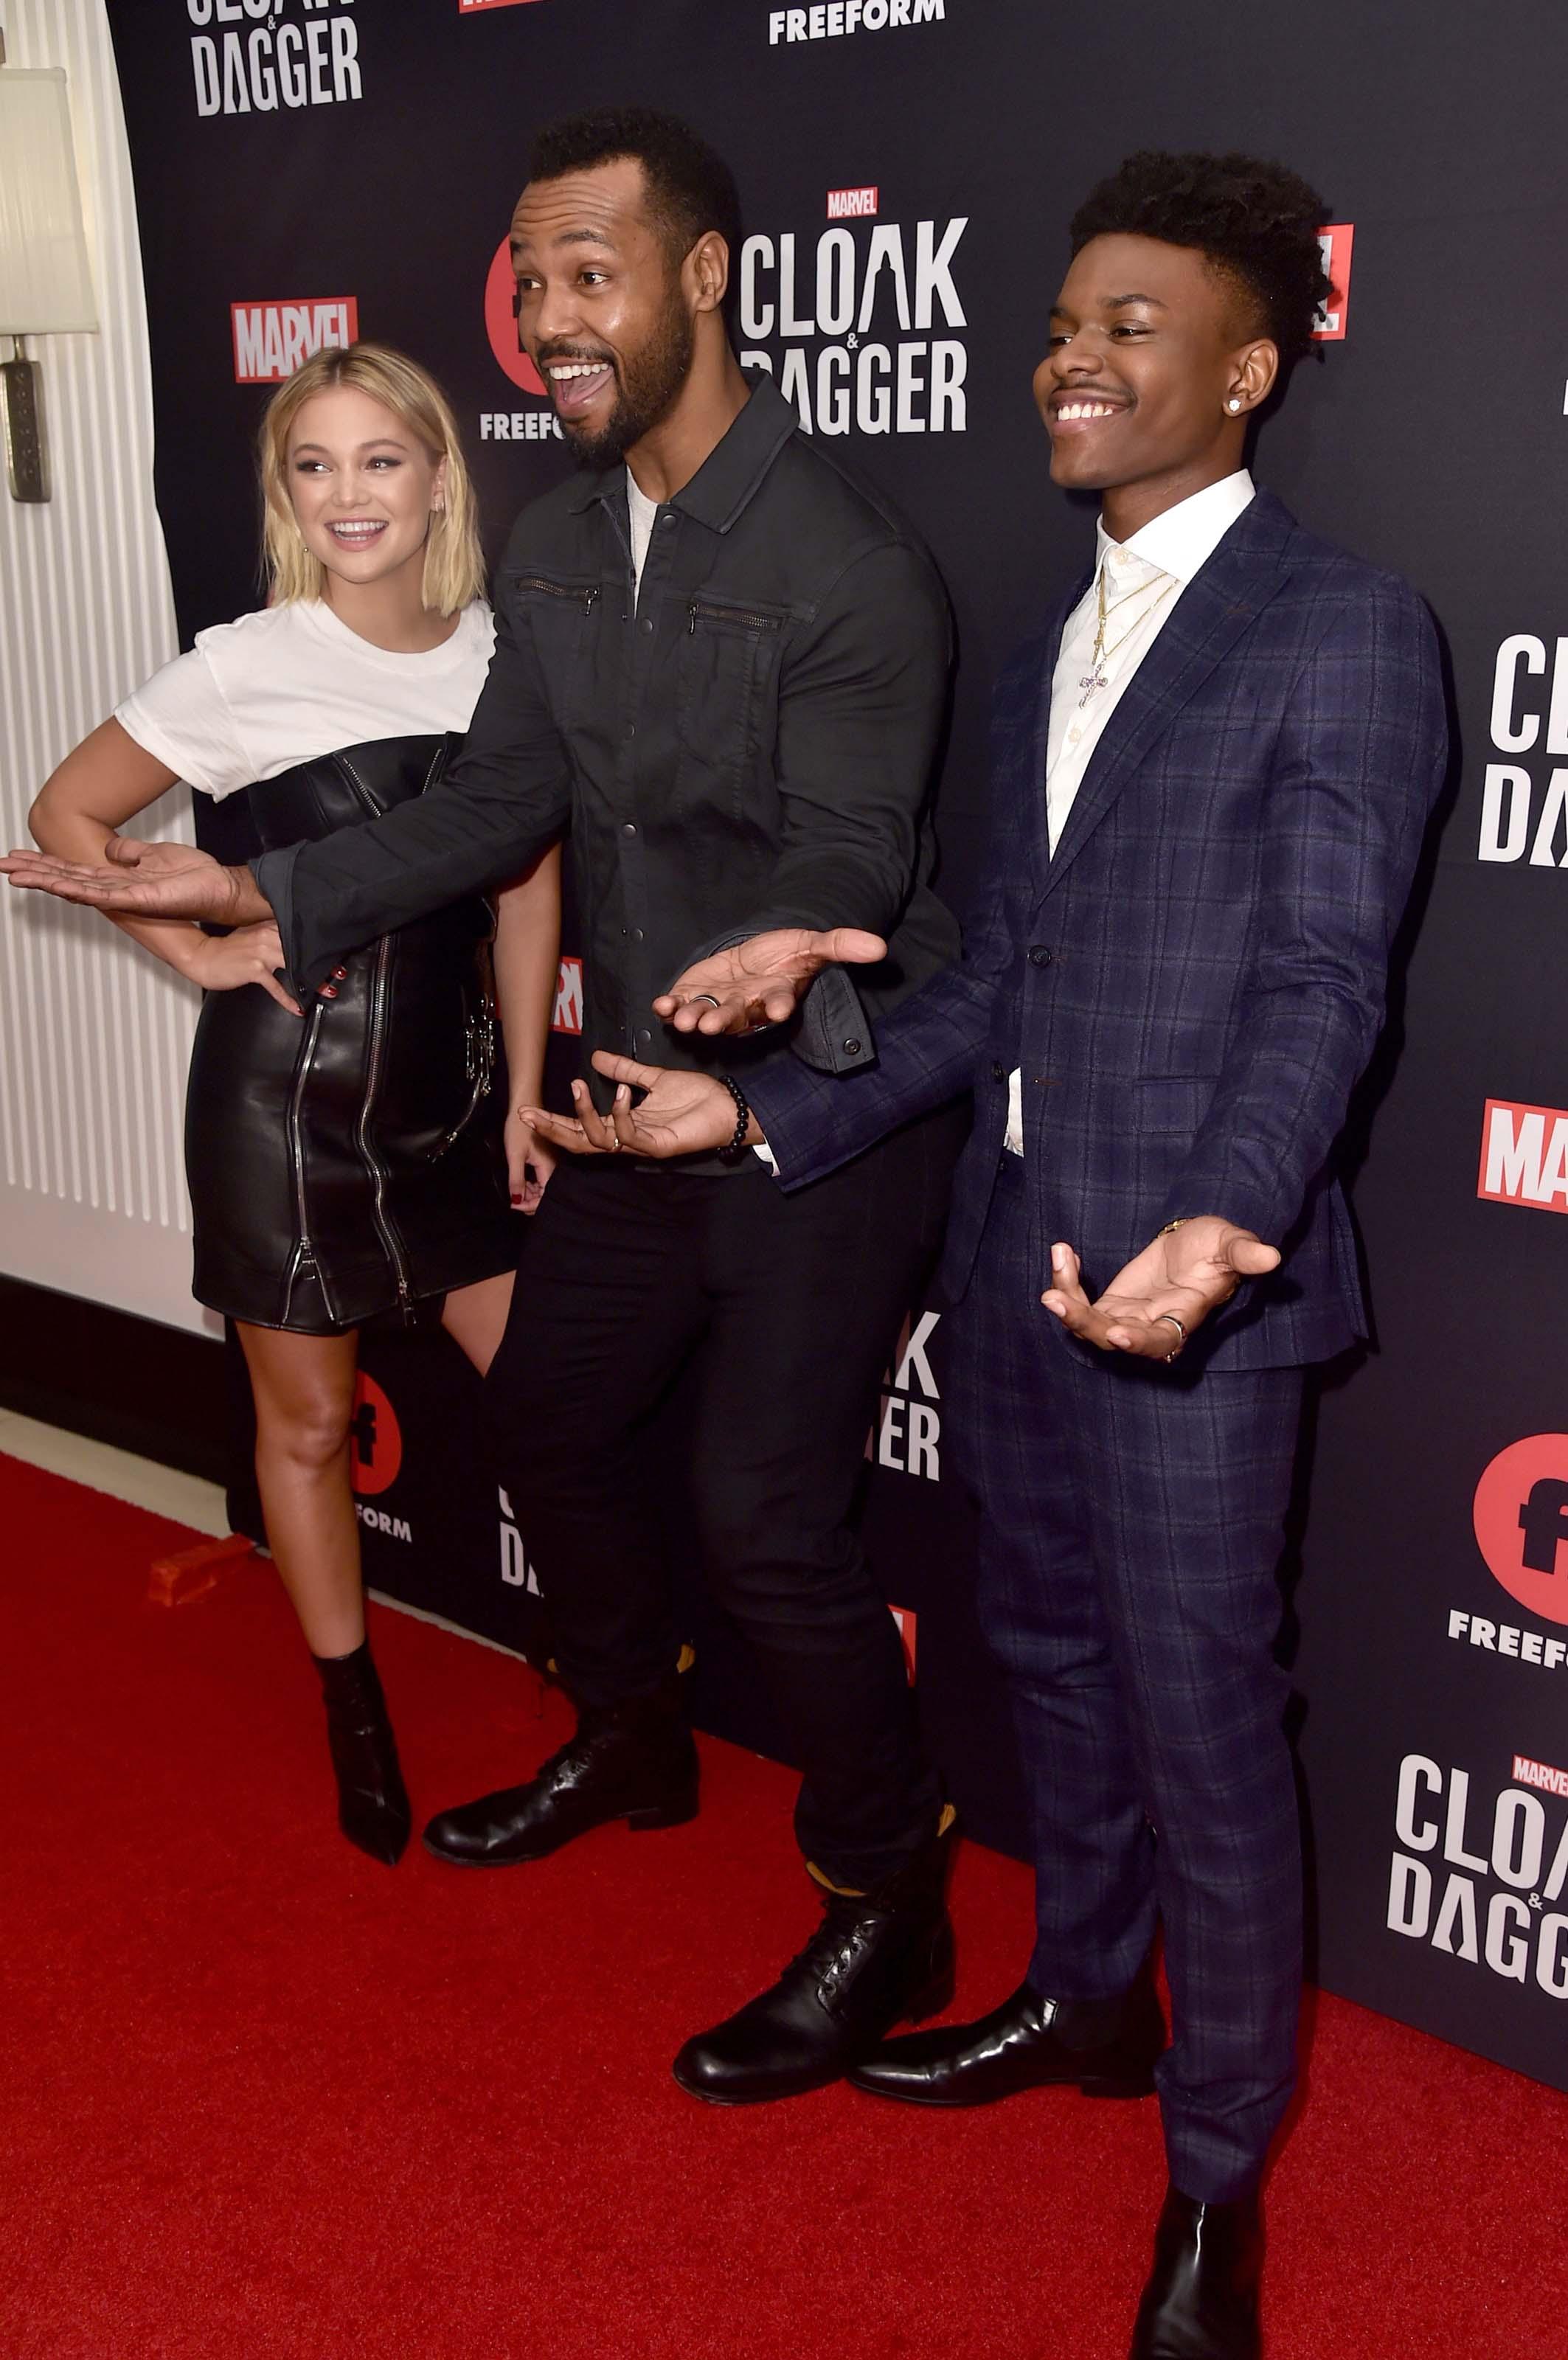 Olivia Holt attends Cloak & Dagger screening